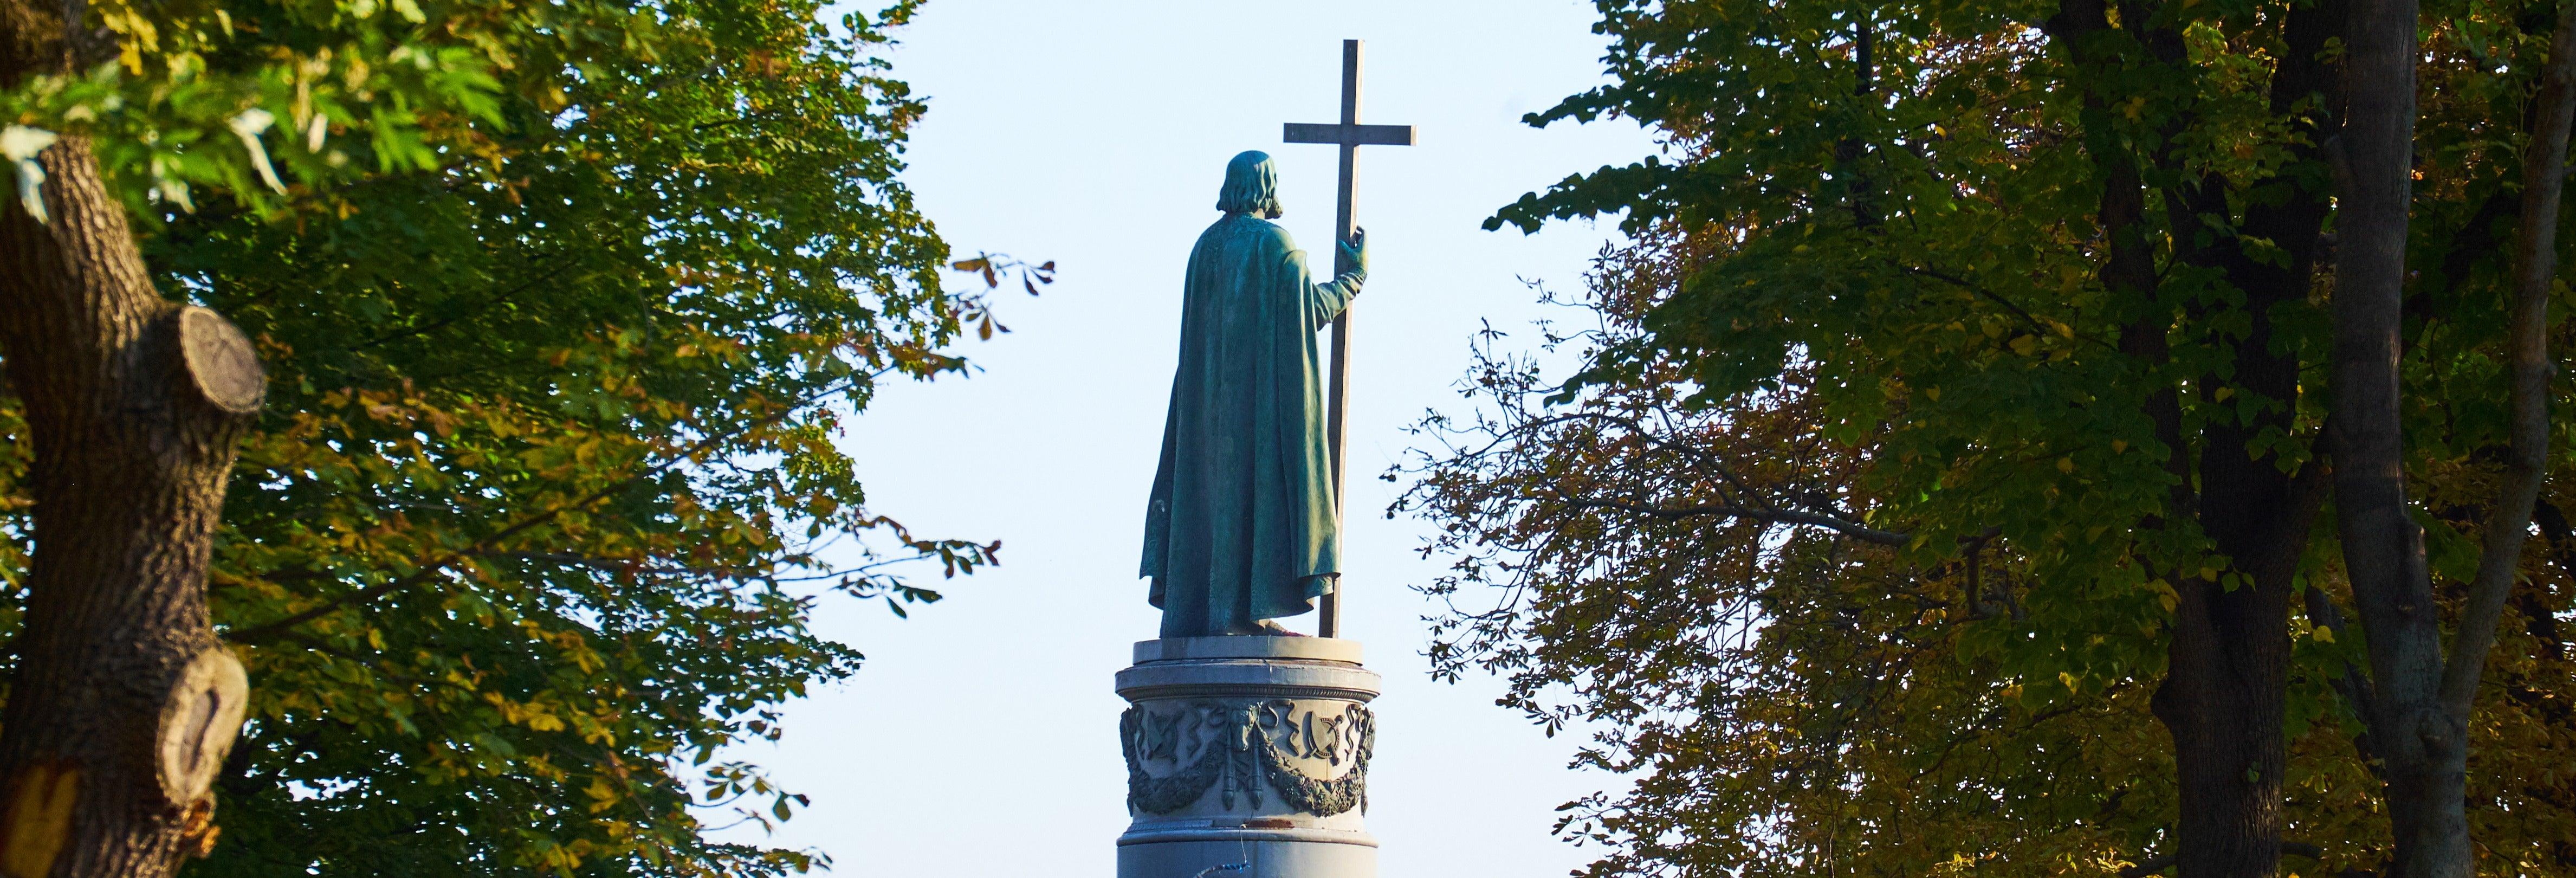 Free tour de los misterios y leyendas de Kiev ¡Gratis!